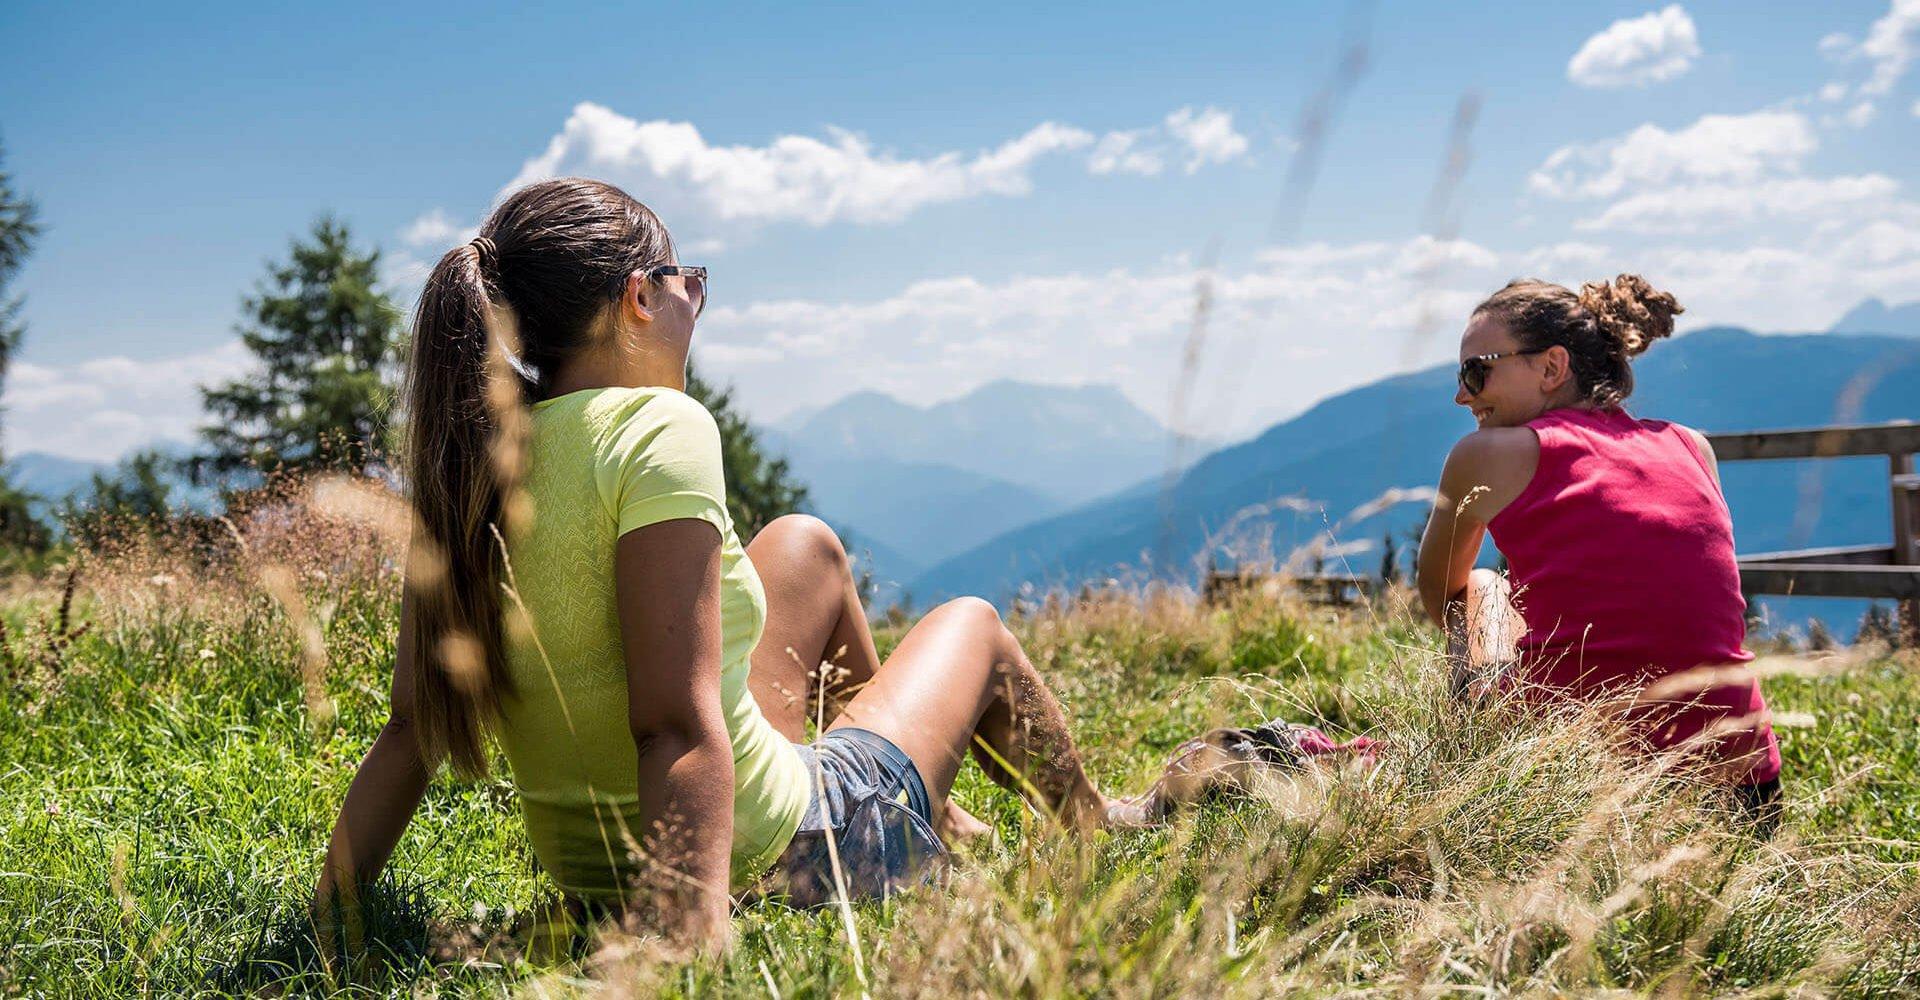 Bäckerhof in Südtirol - Urlaub im Pustertal in den Dolomiten